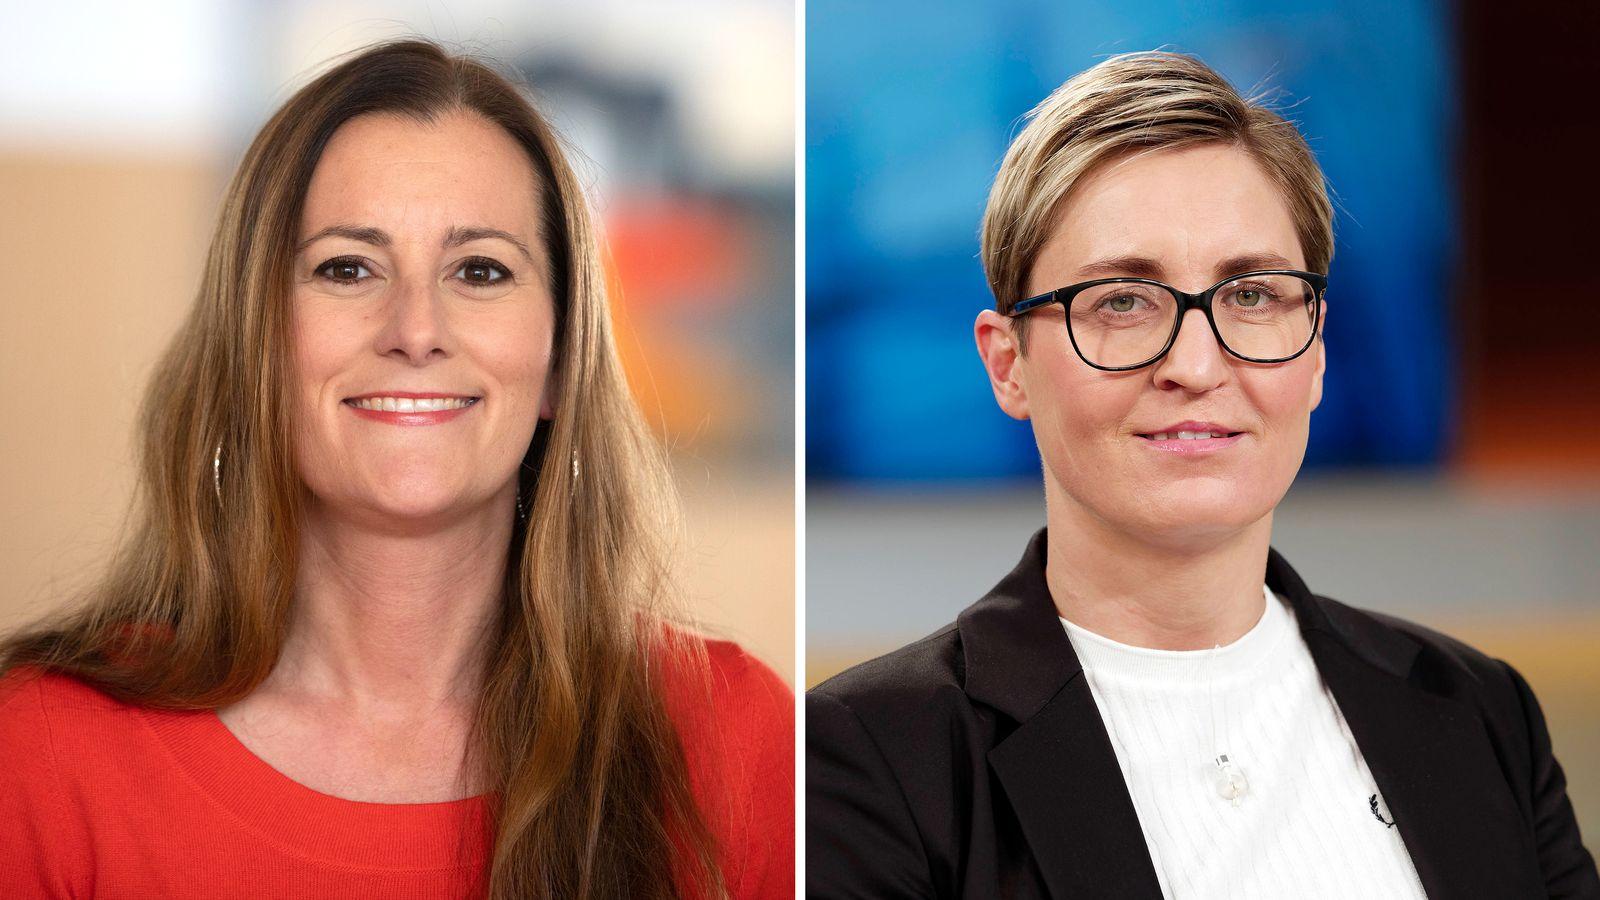 KOMBO Die Linke / Kandidatinnen